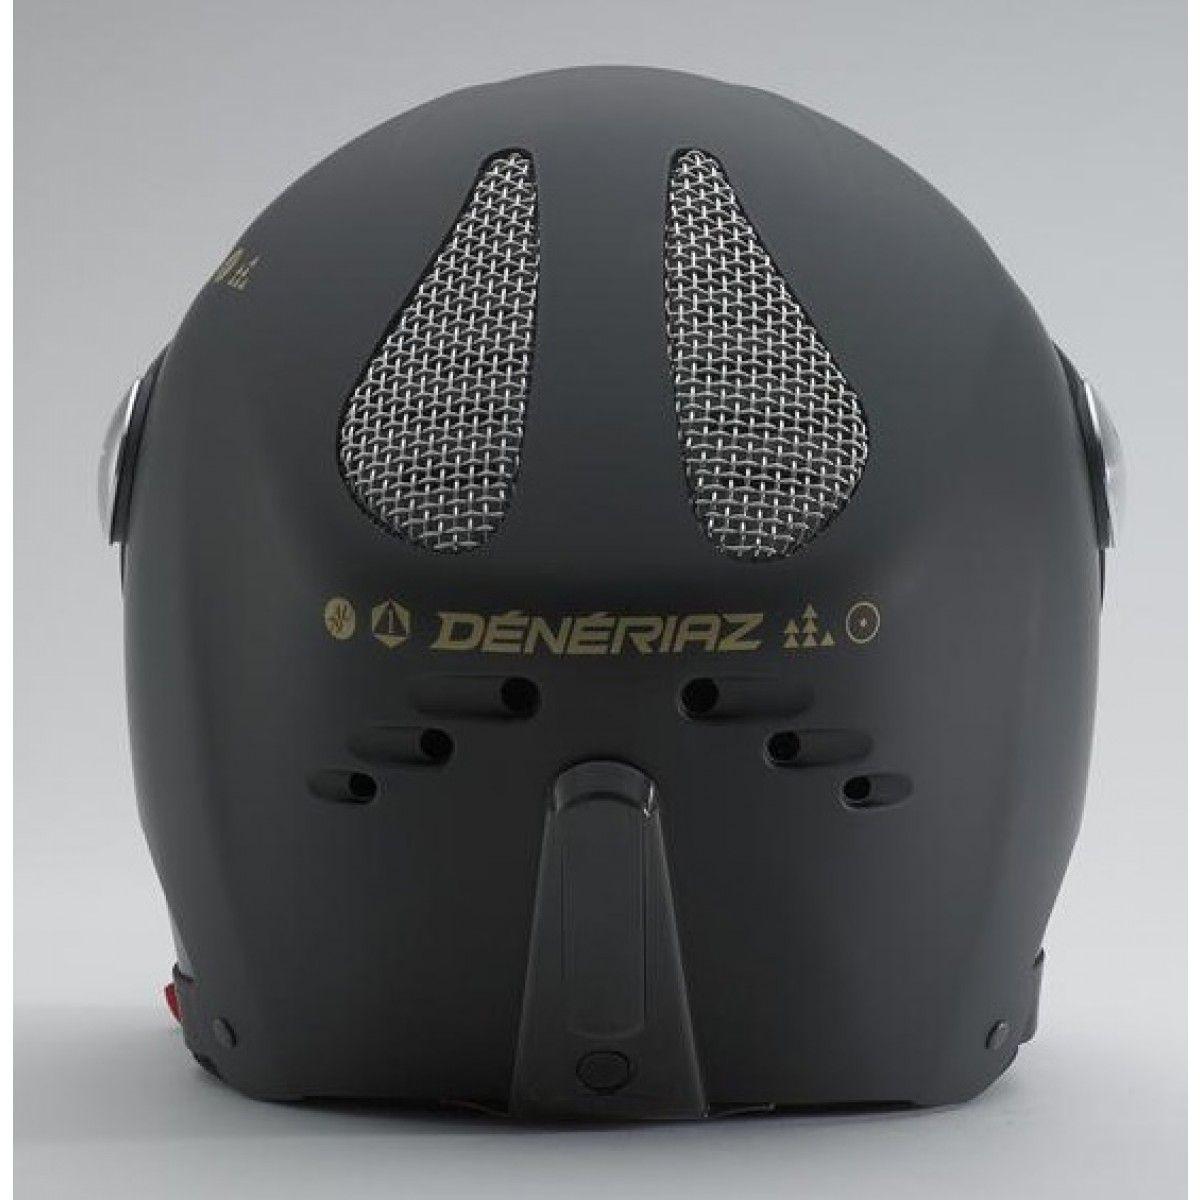 Casque Ski Vision Air 2 Deneriaz Noir Ski Helmets Riding Helmets